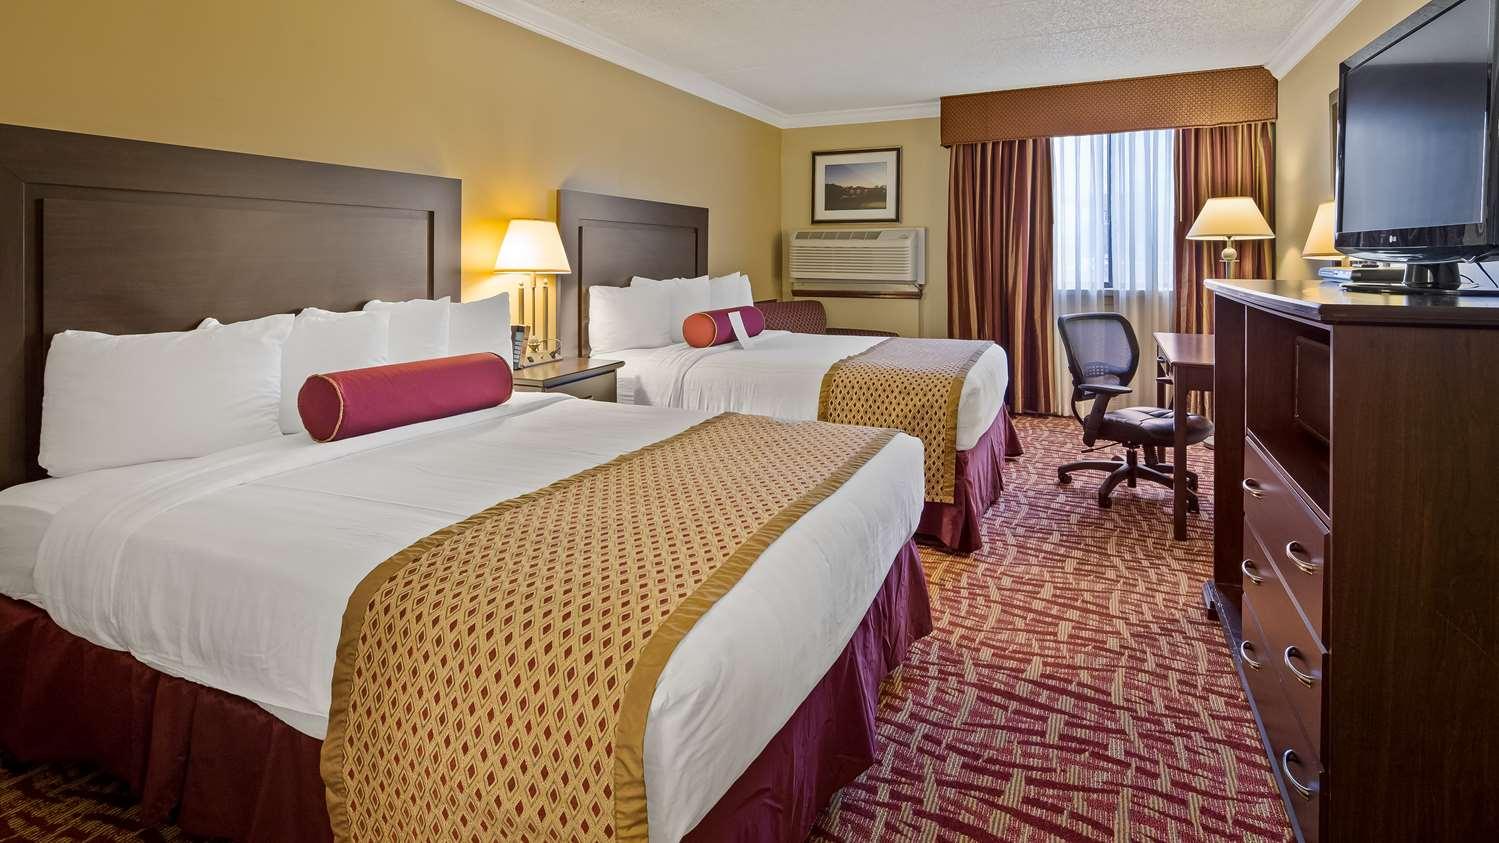 Room Best Western Plus Genetti Hotel Conference Center Wilkes Barre